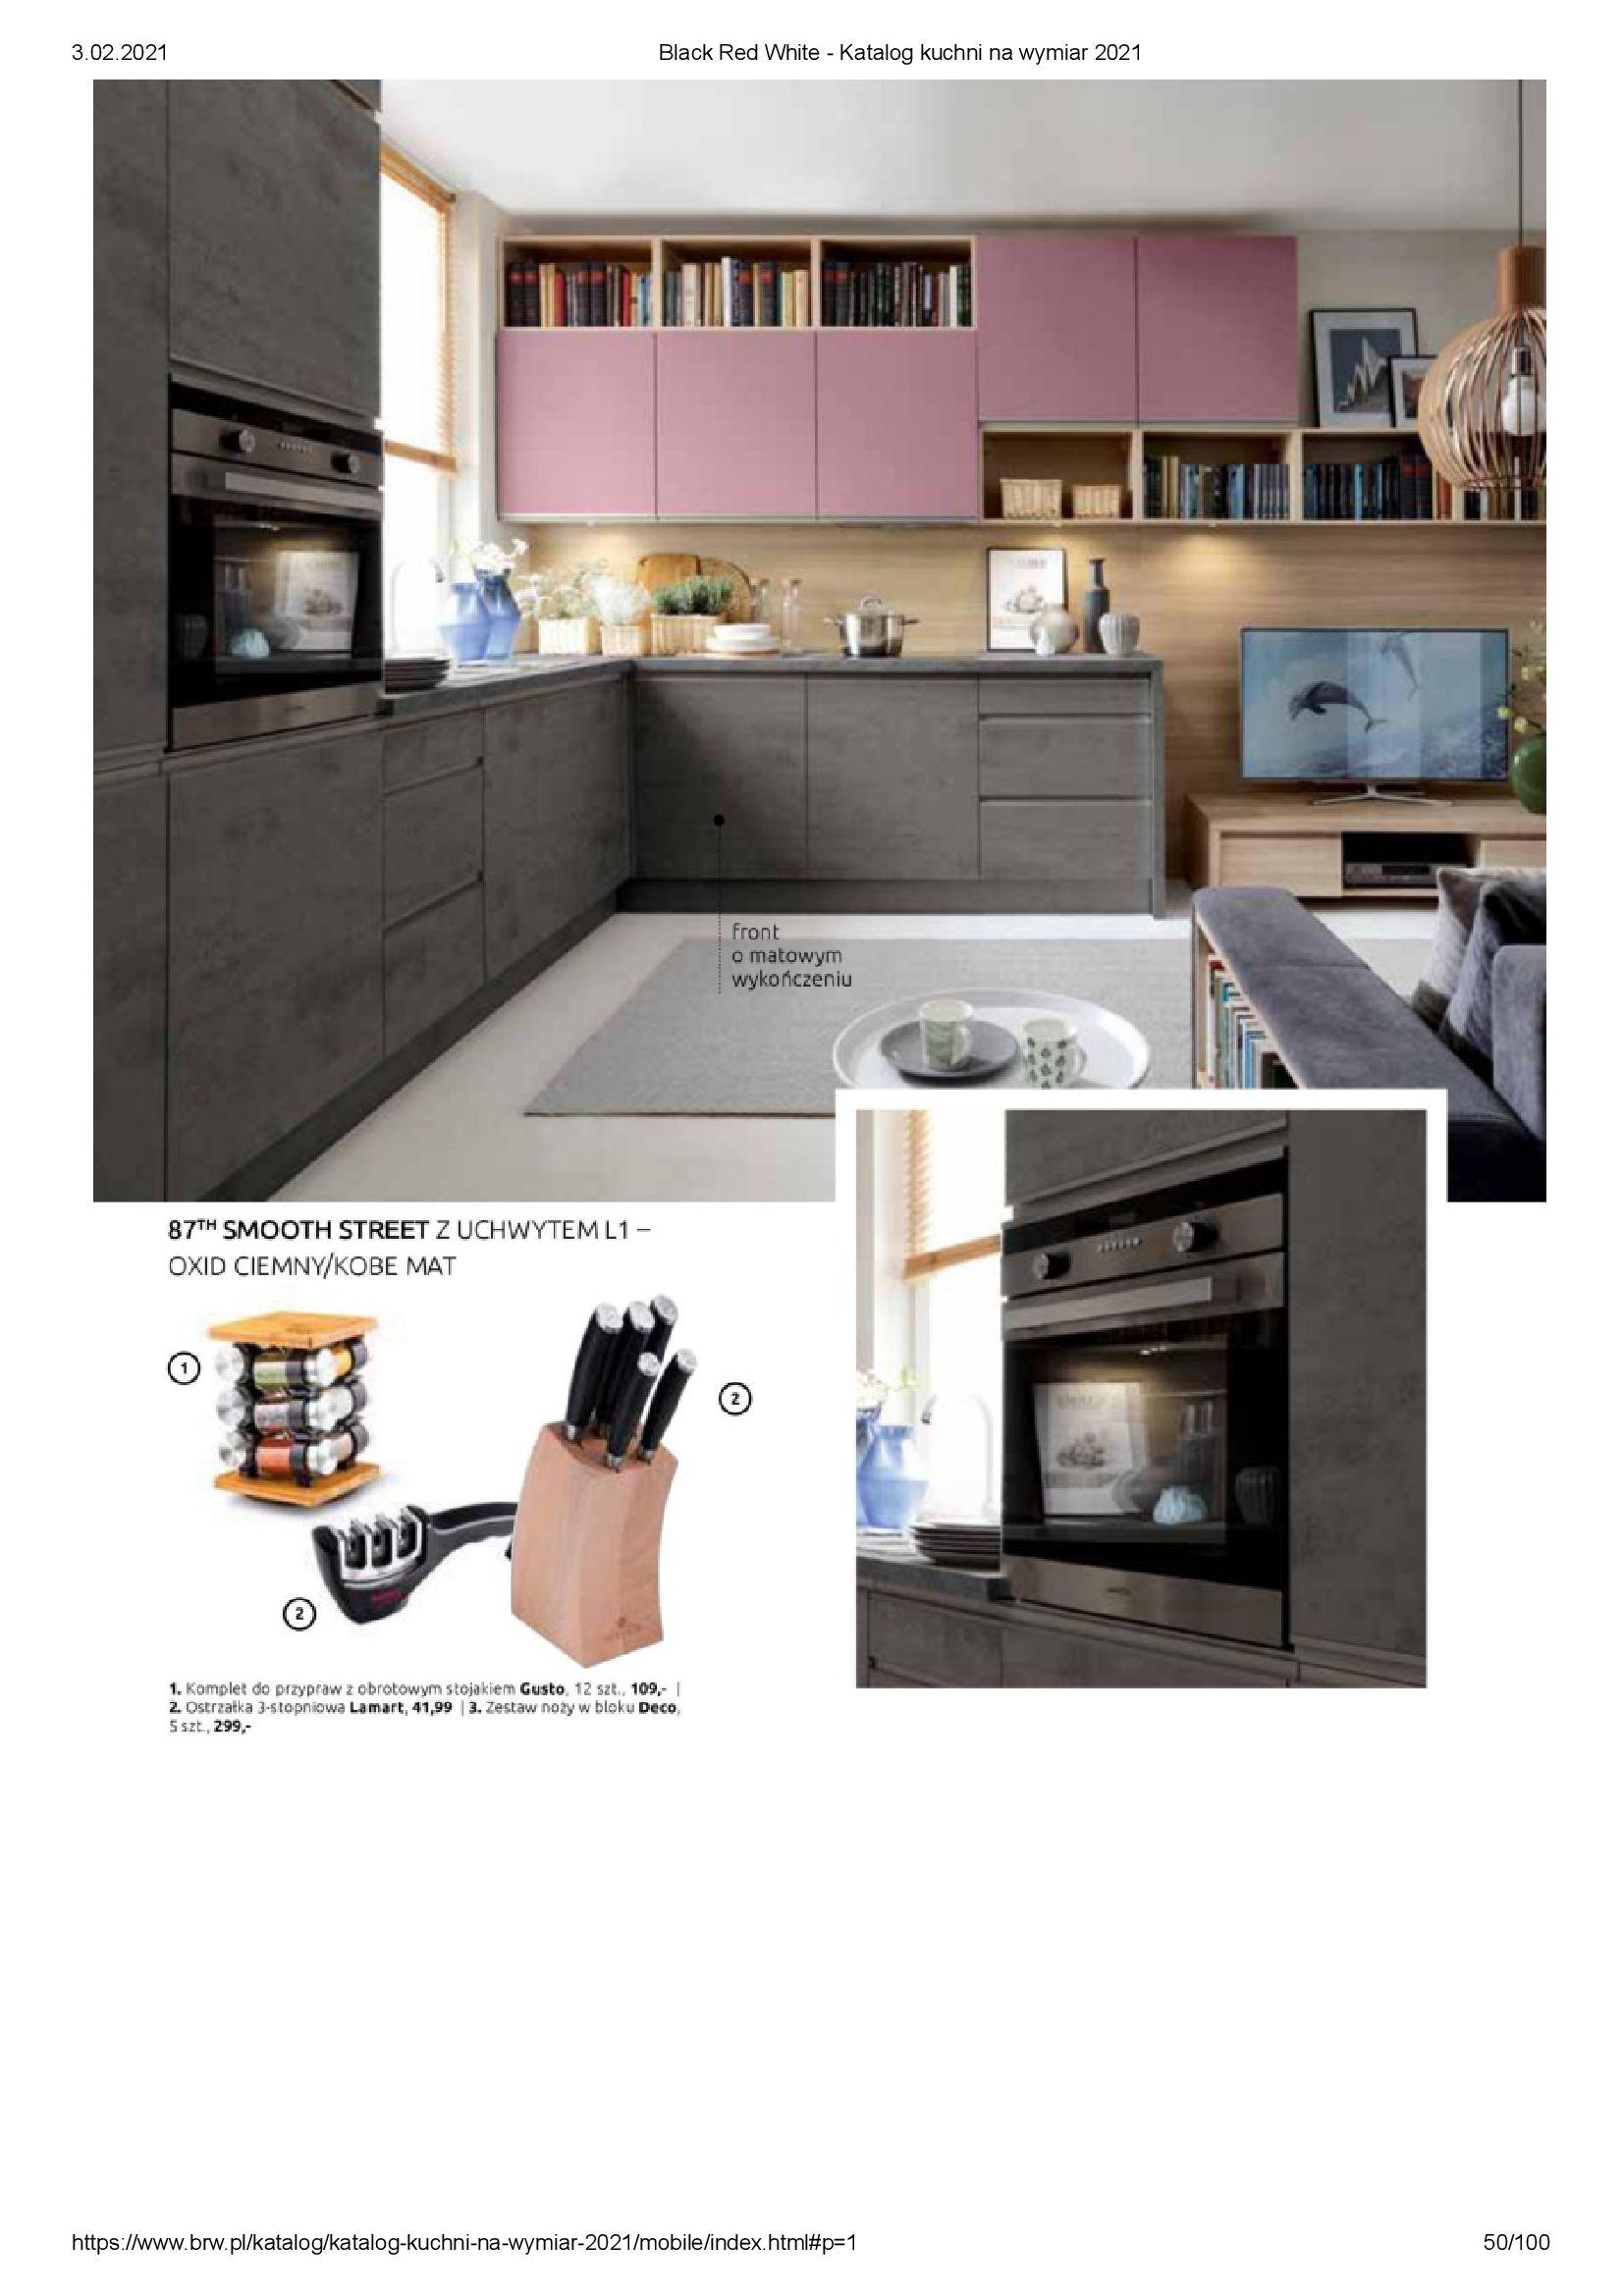 Gazetka Black Red White: Katalog - Kuchnie na wymiar Senso Kitchens 2021 2021-01-01 page-50